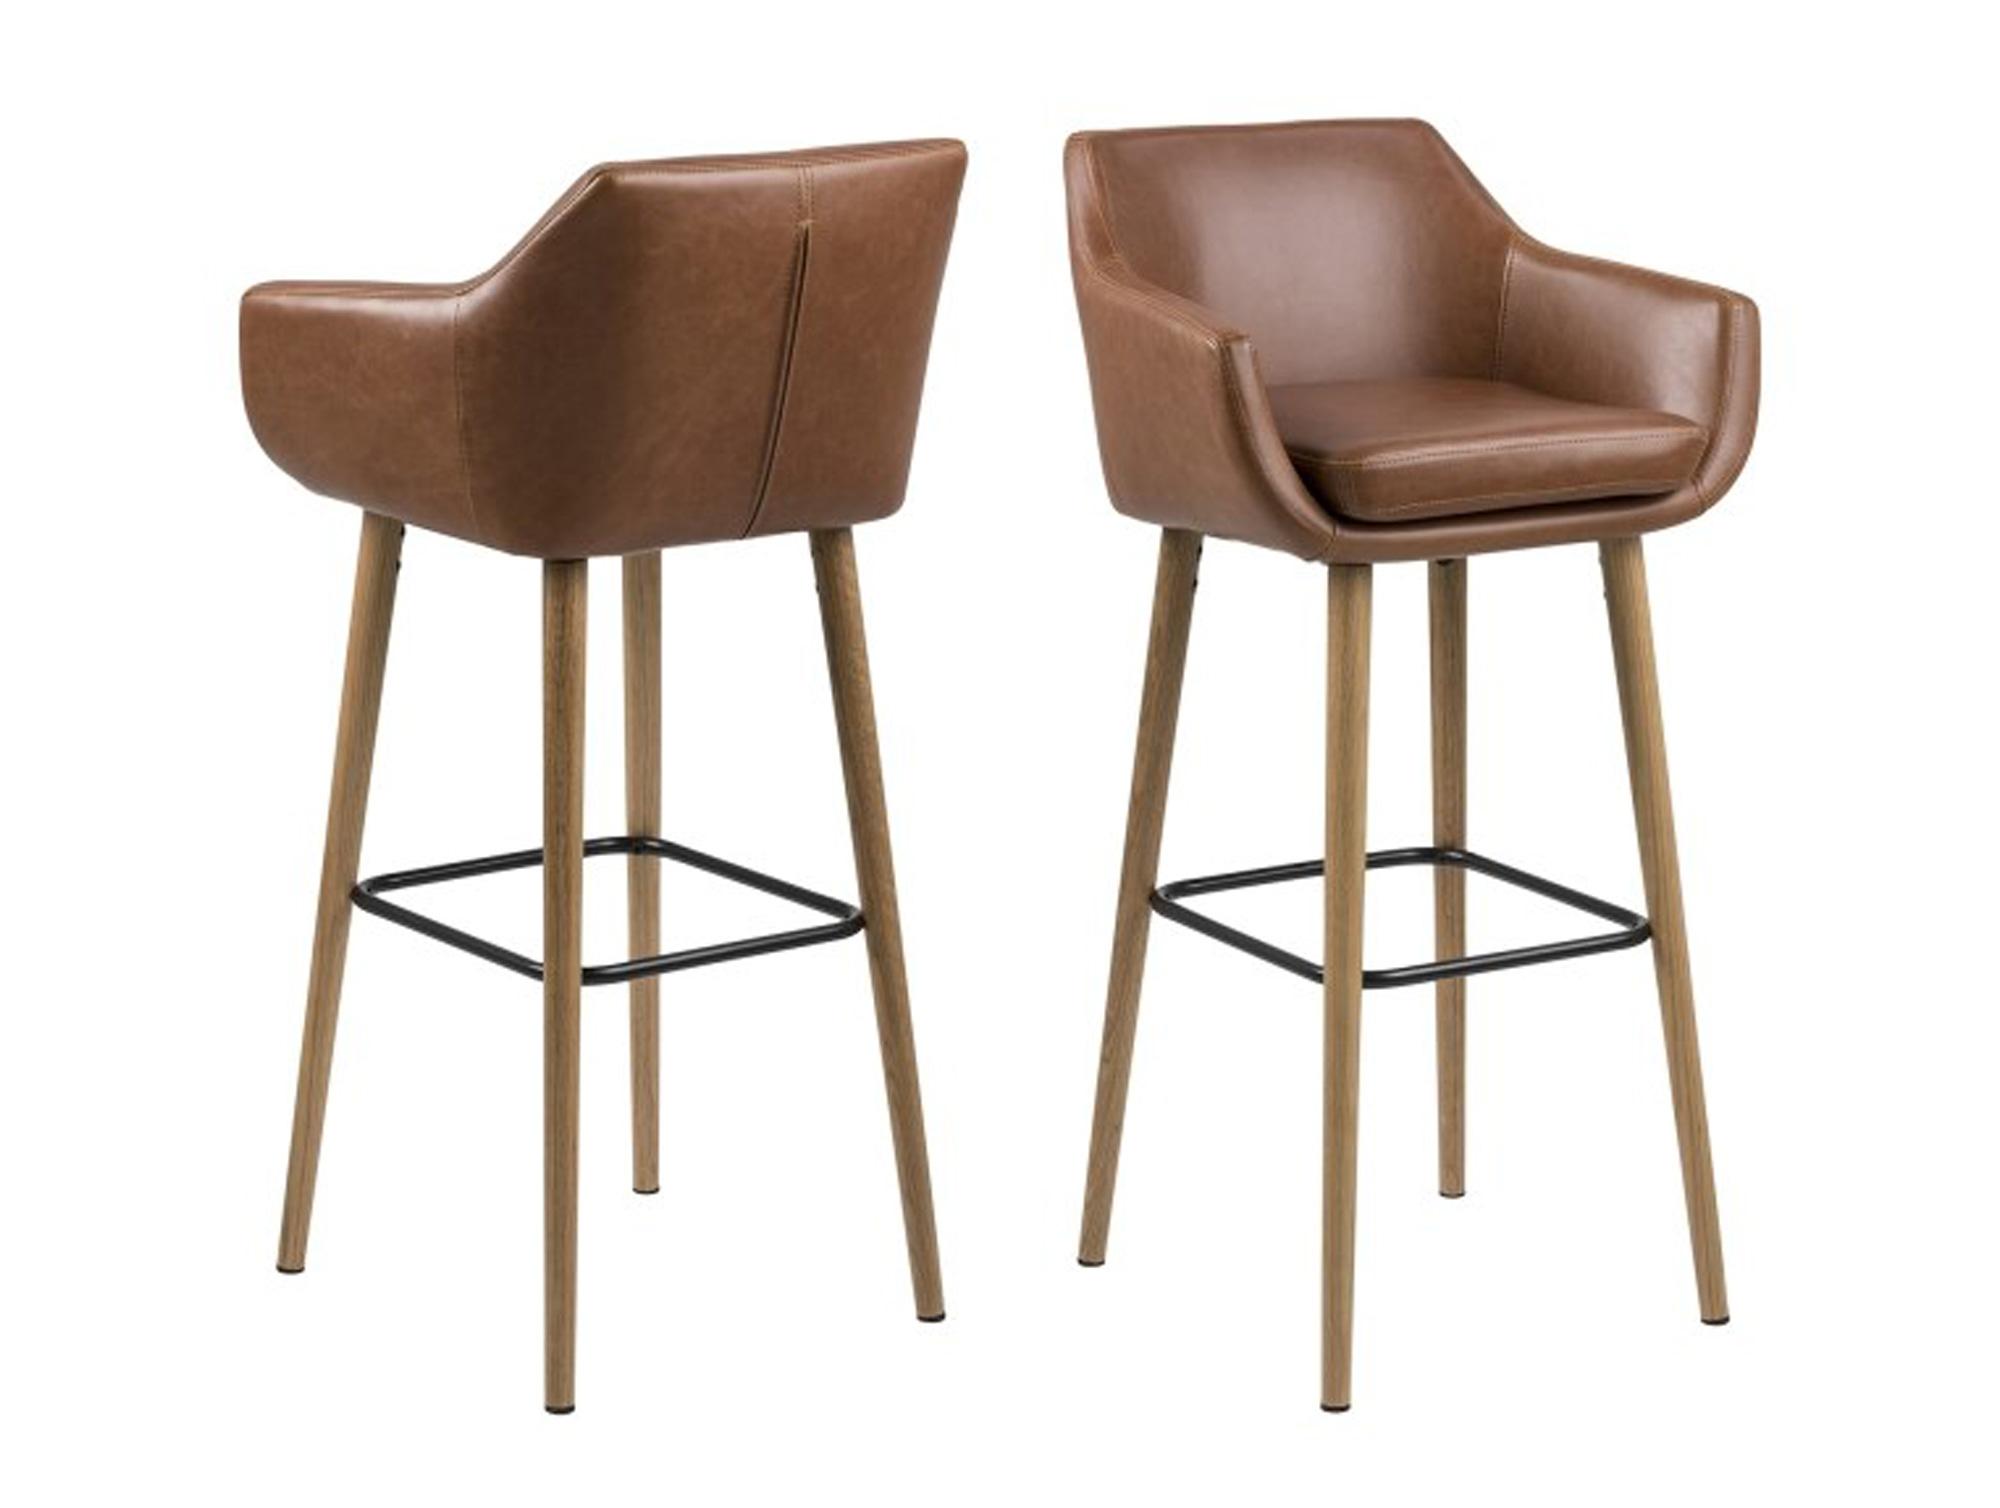 napola barhocker eiche pu vintage cognac. Black Bedroom Furniture Sets. Home Design Ideas